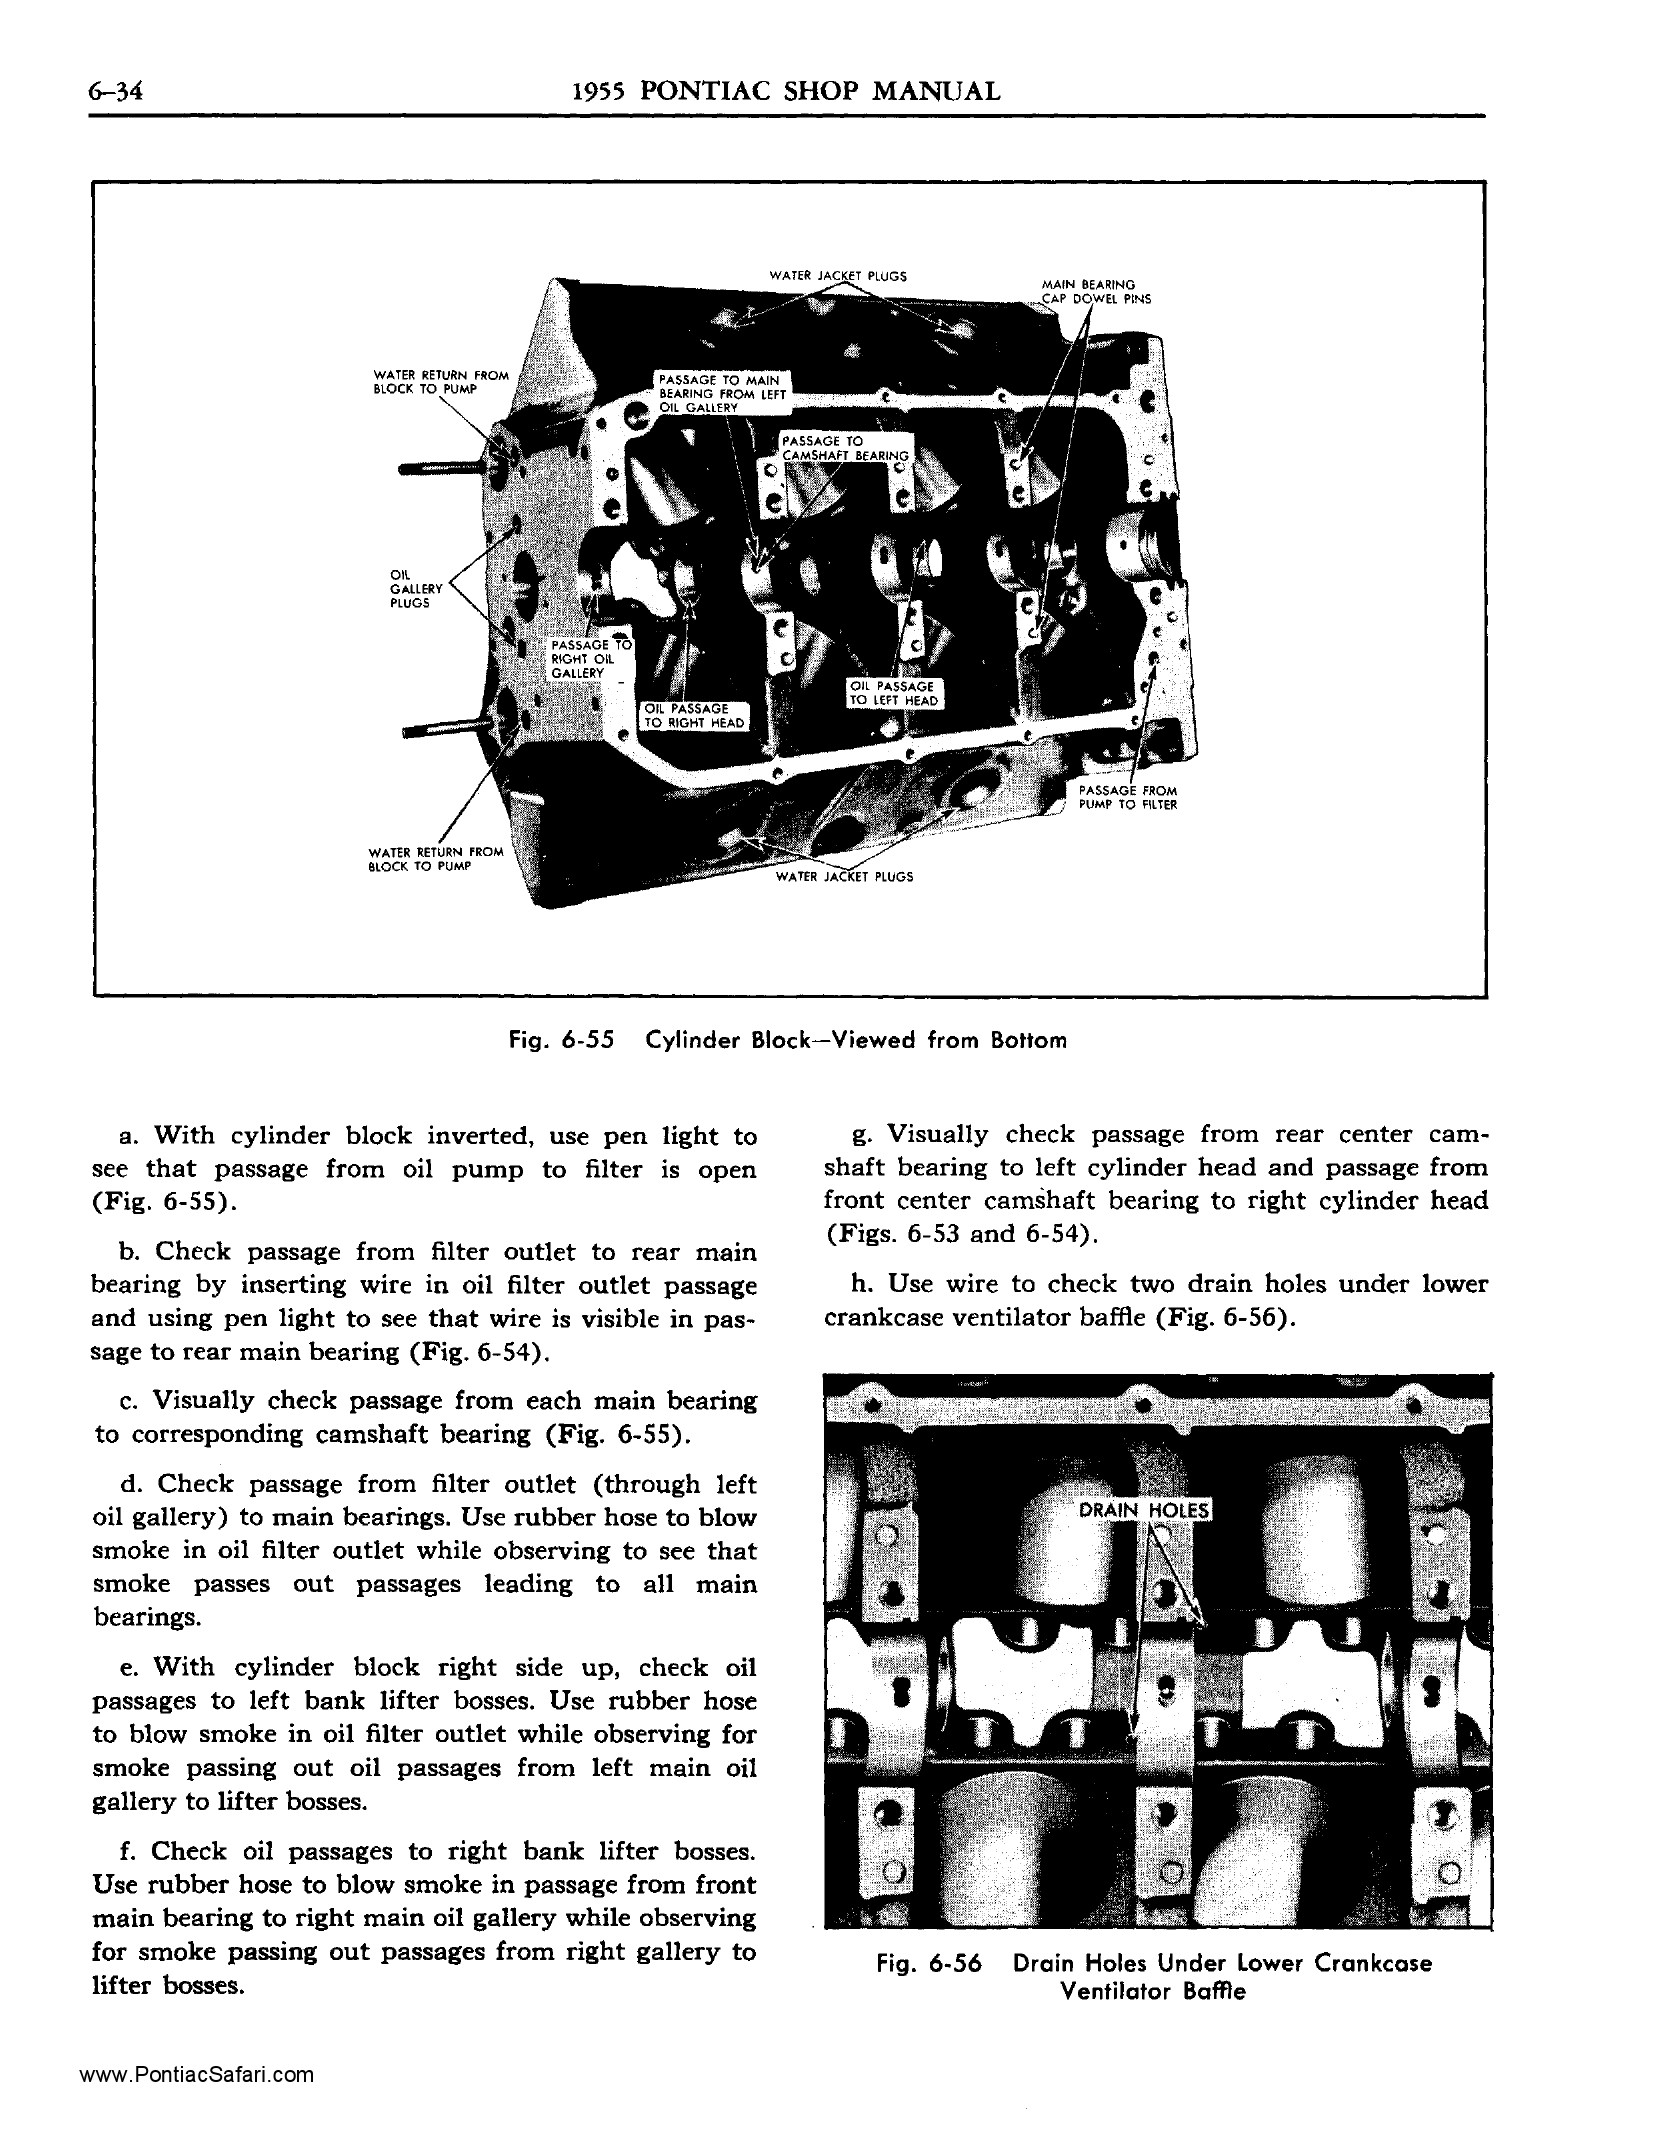 1955 Pontiac Shop Manual- Engine Mechanical Page 35 of 53